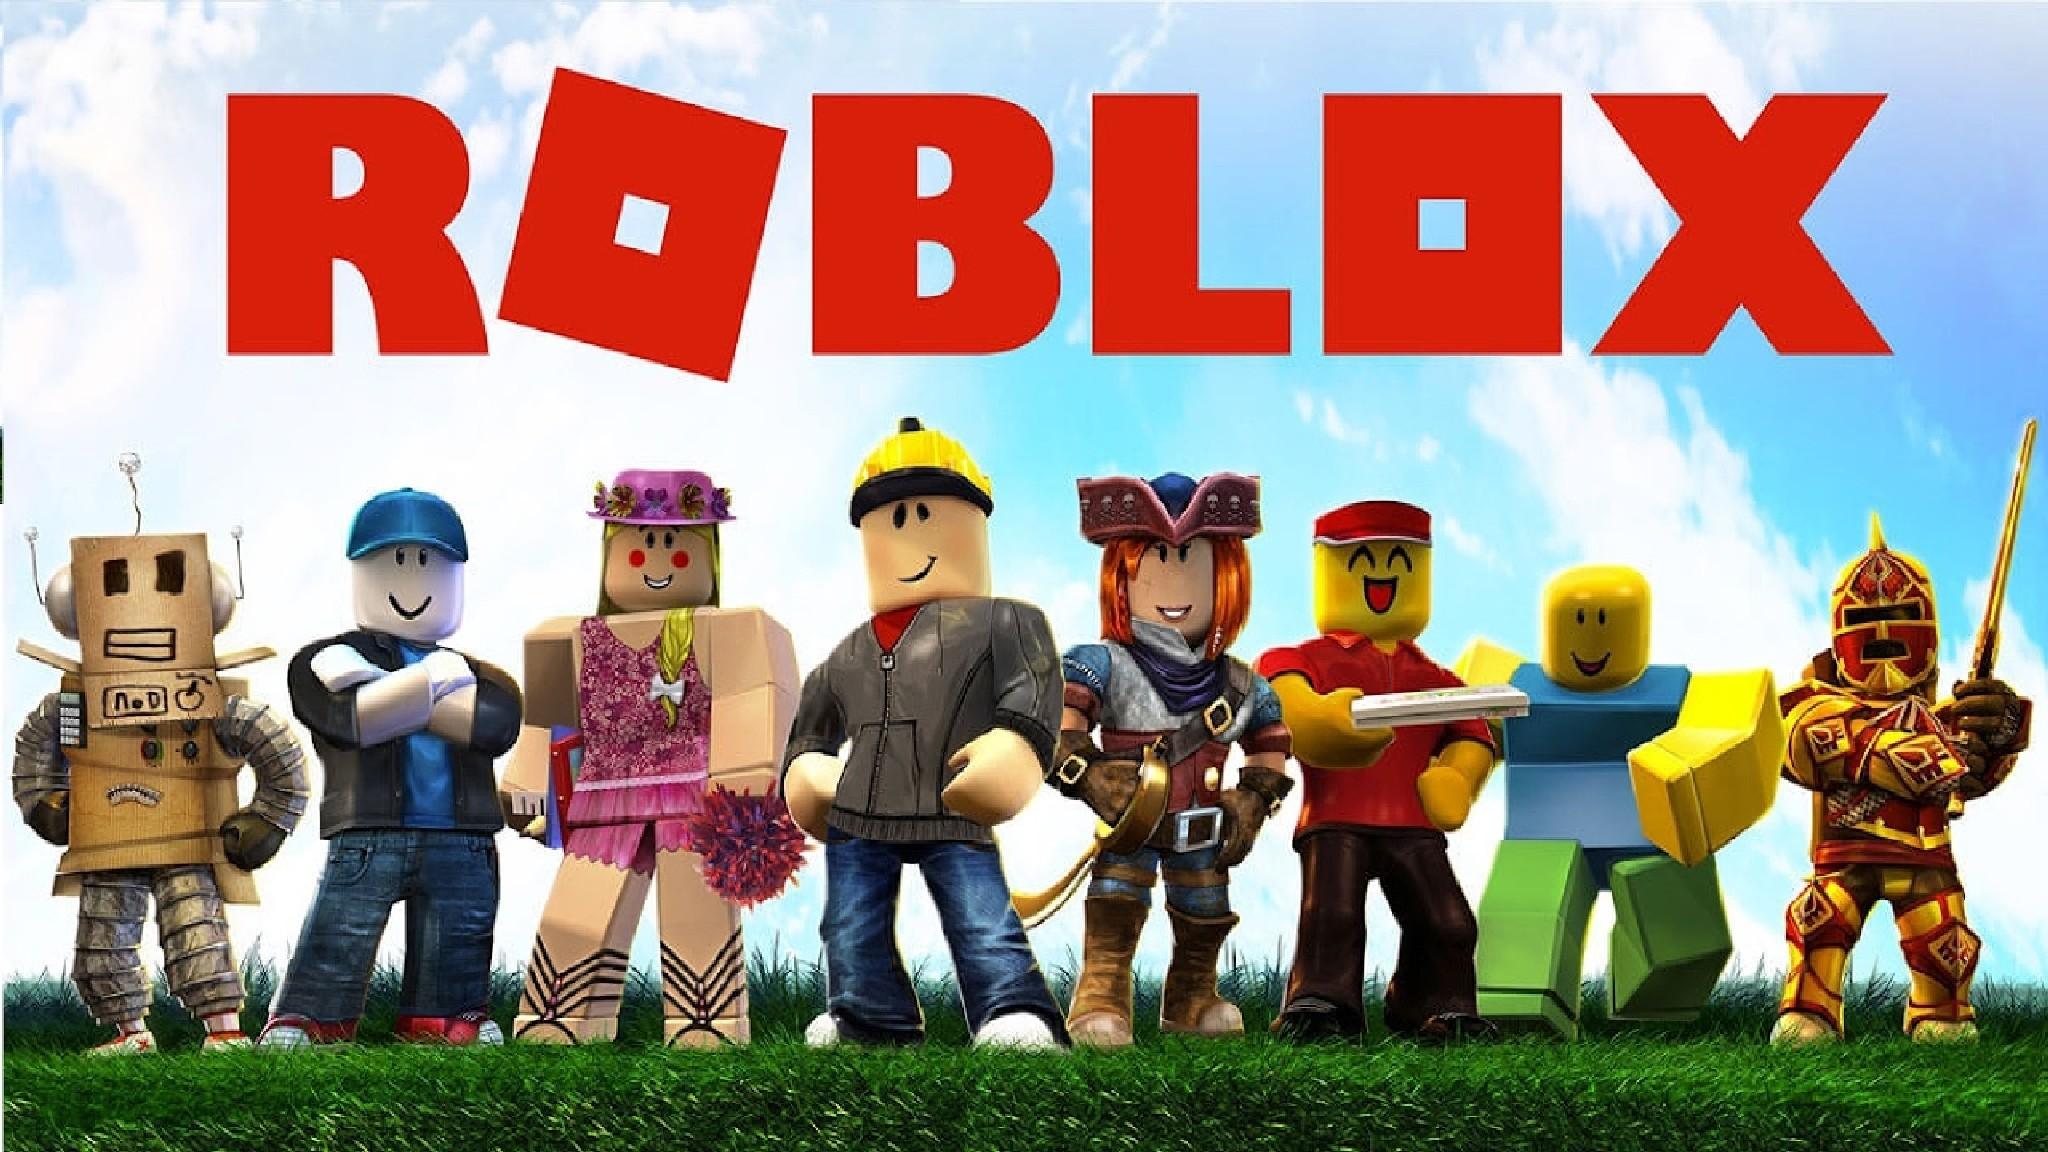 Играть ROBLOX онлайн